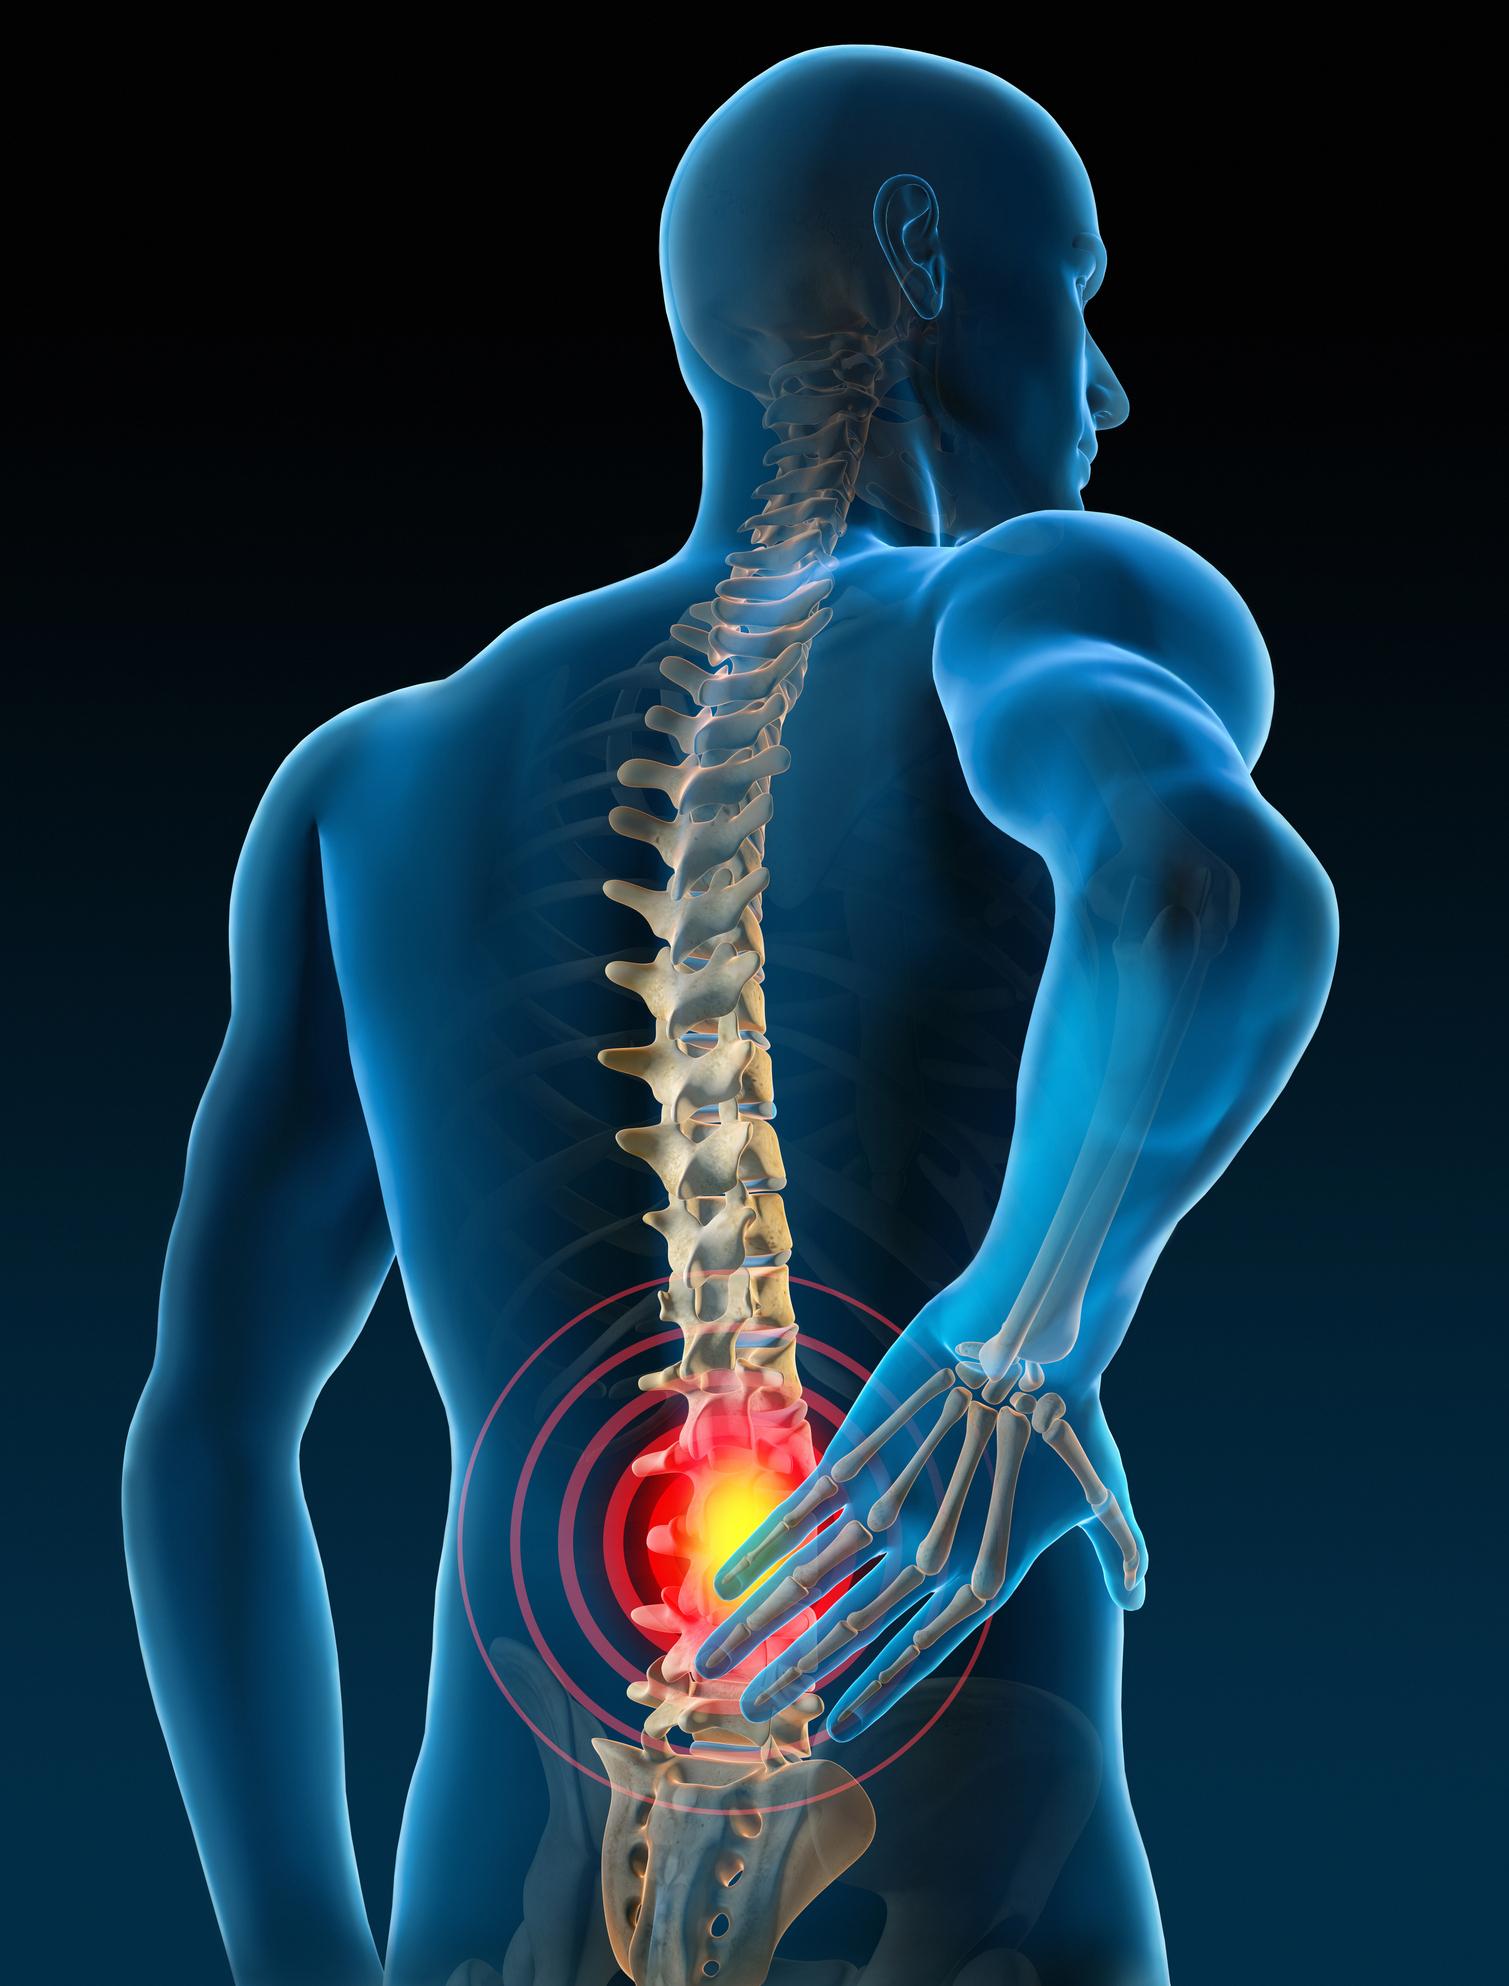 Scoliosis Back Pain illustration